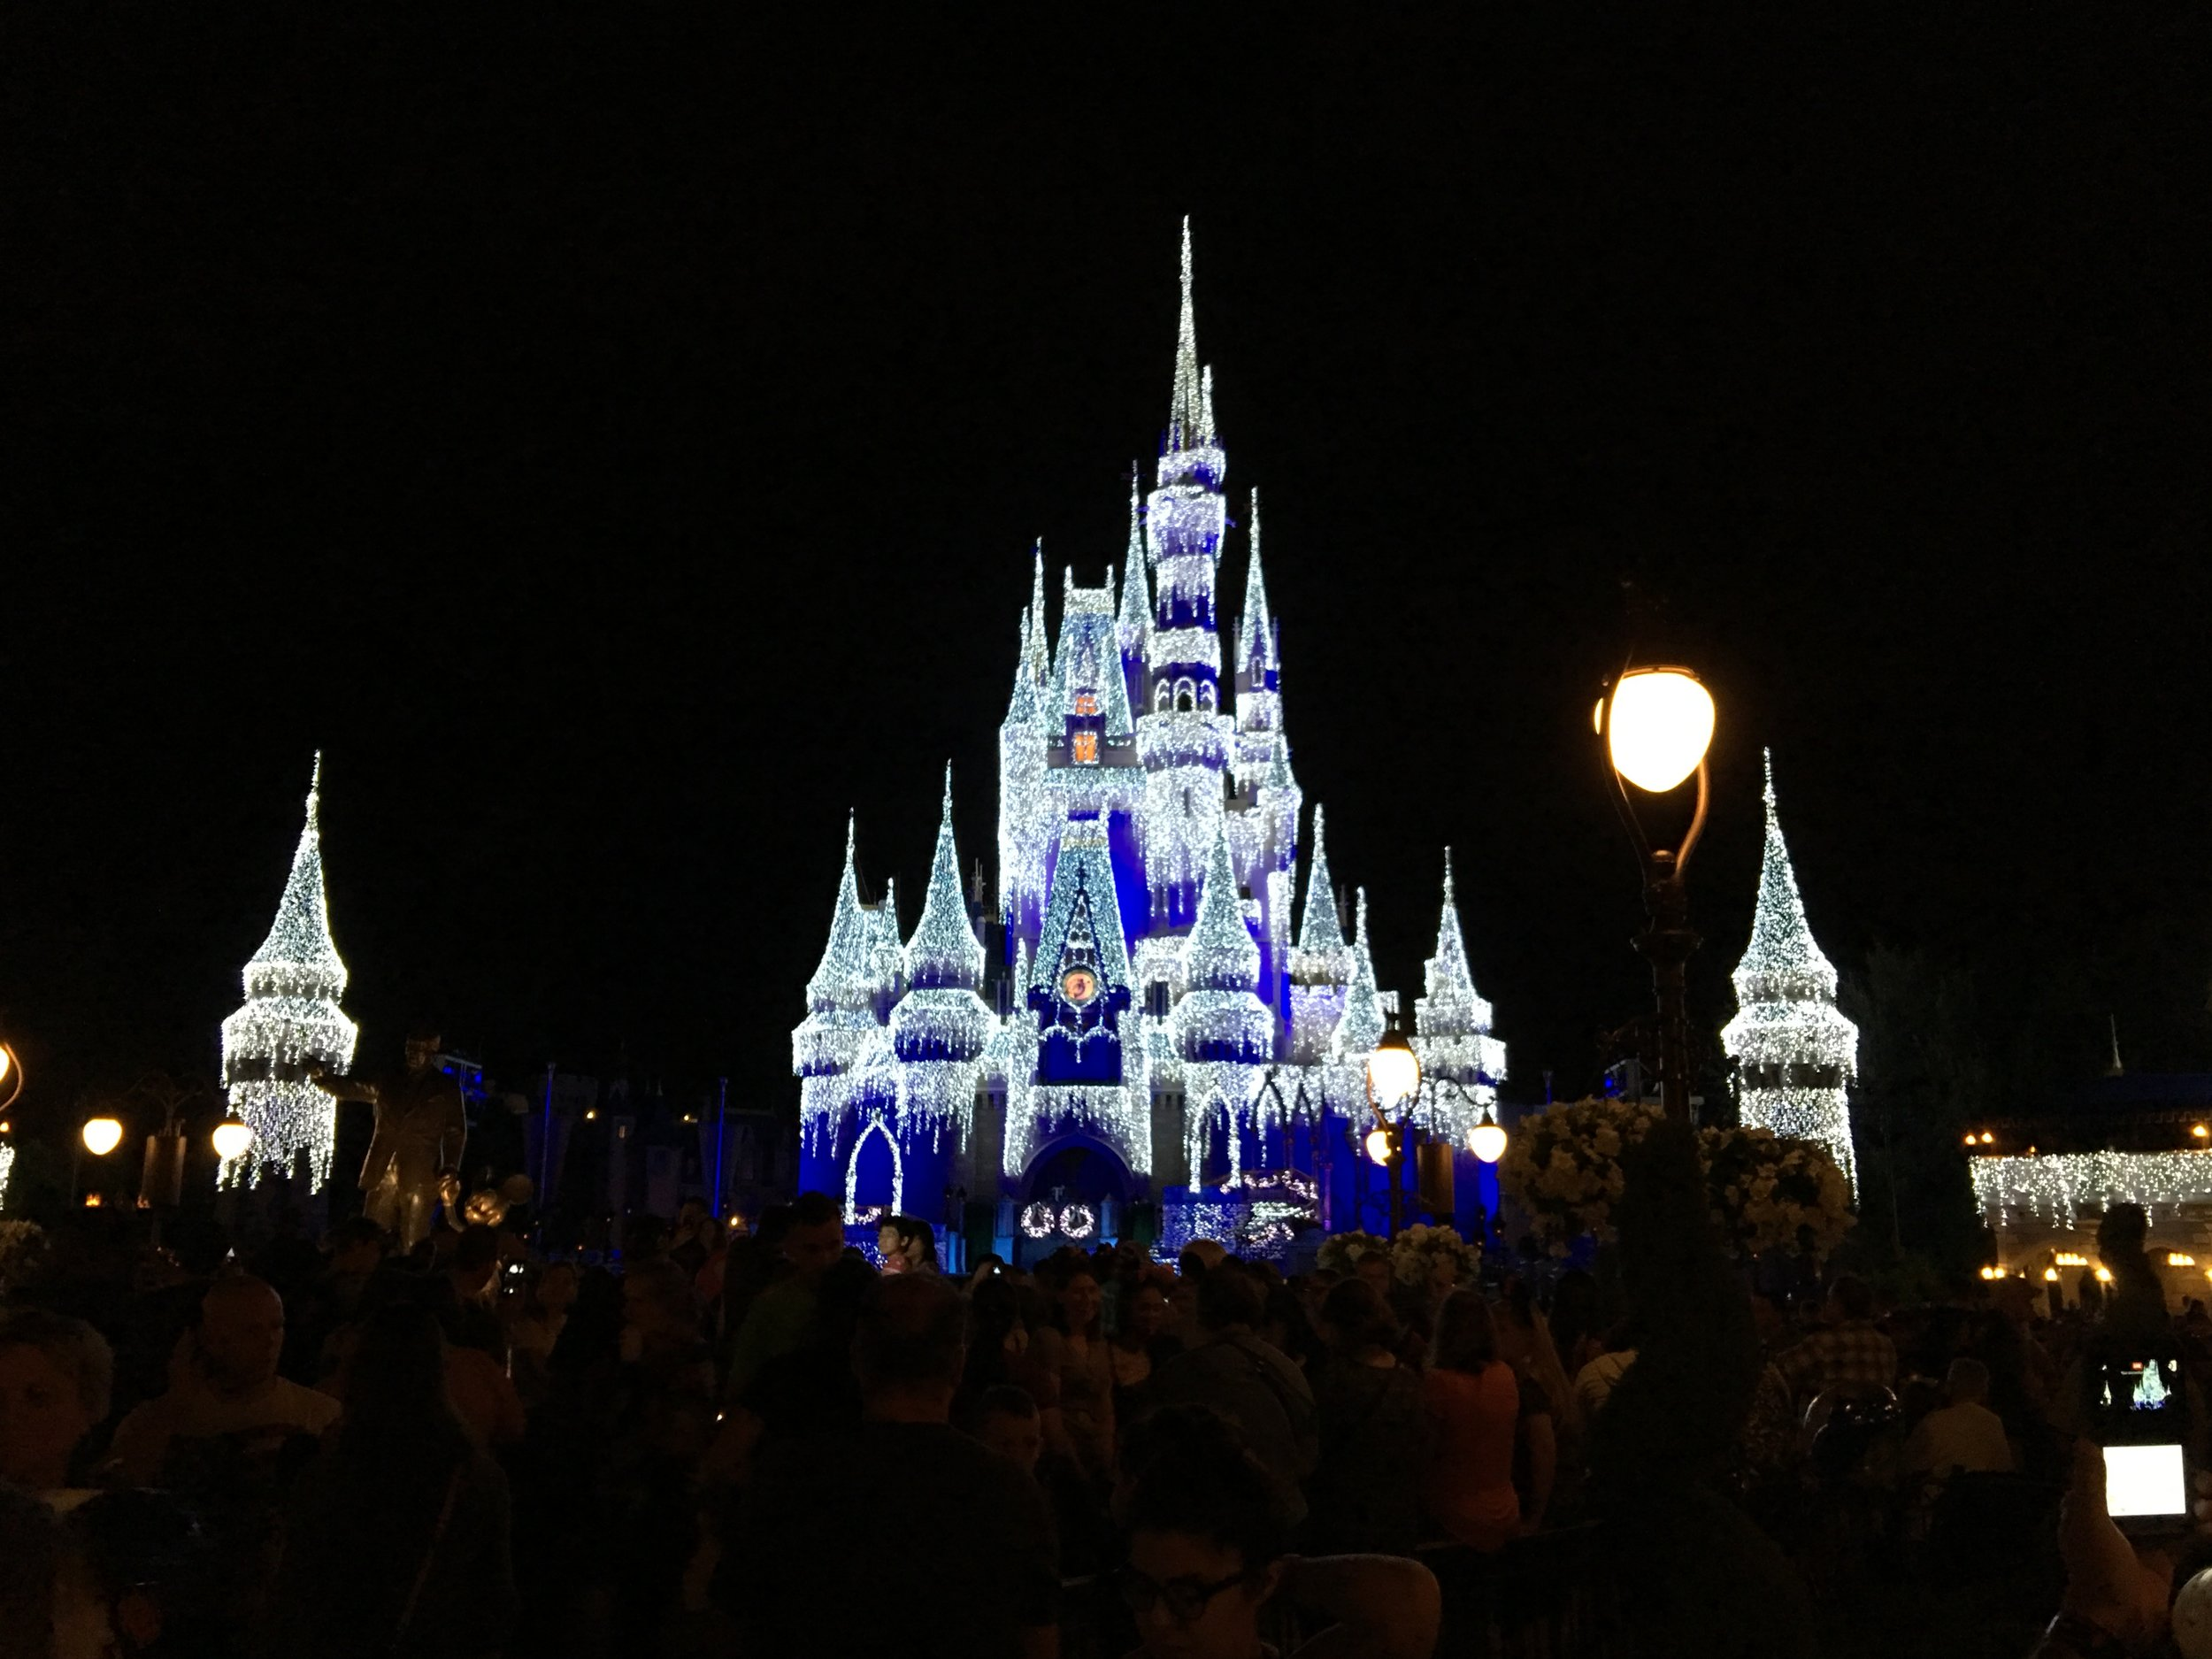 Cinderella's Castle Frozen